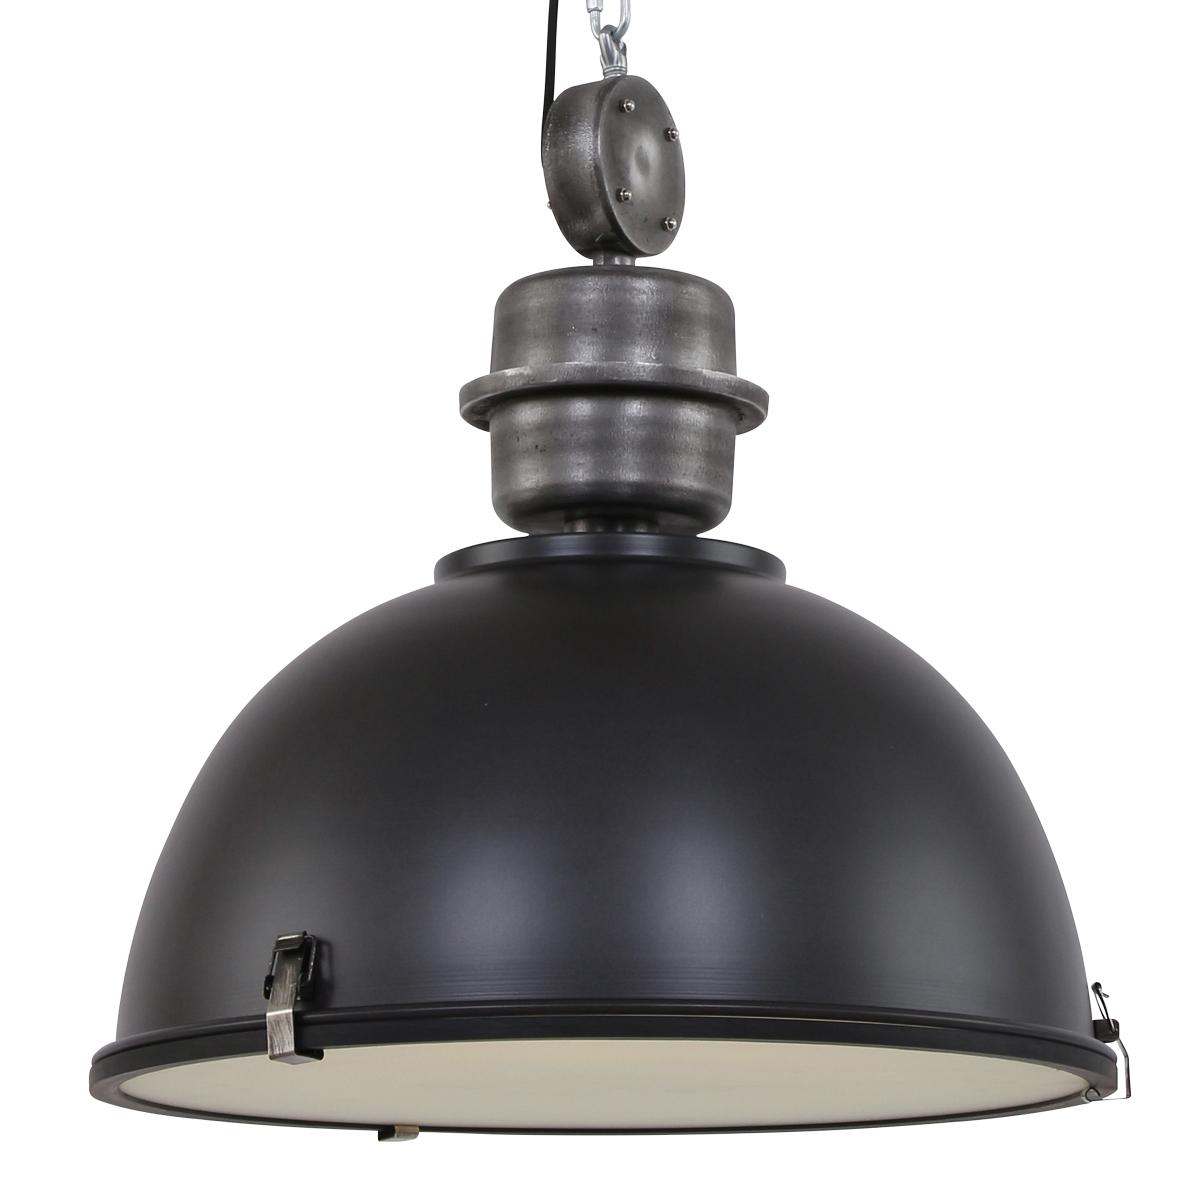 hanglamp industrieel core xl zwart 52cm industriele lampen online. Black Bedroom Furniture Sets. Home Design Ideas